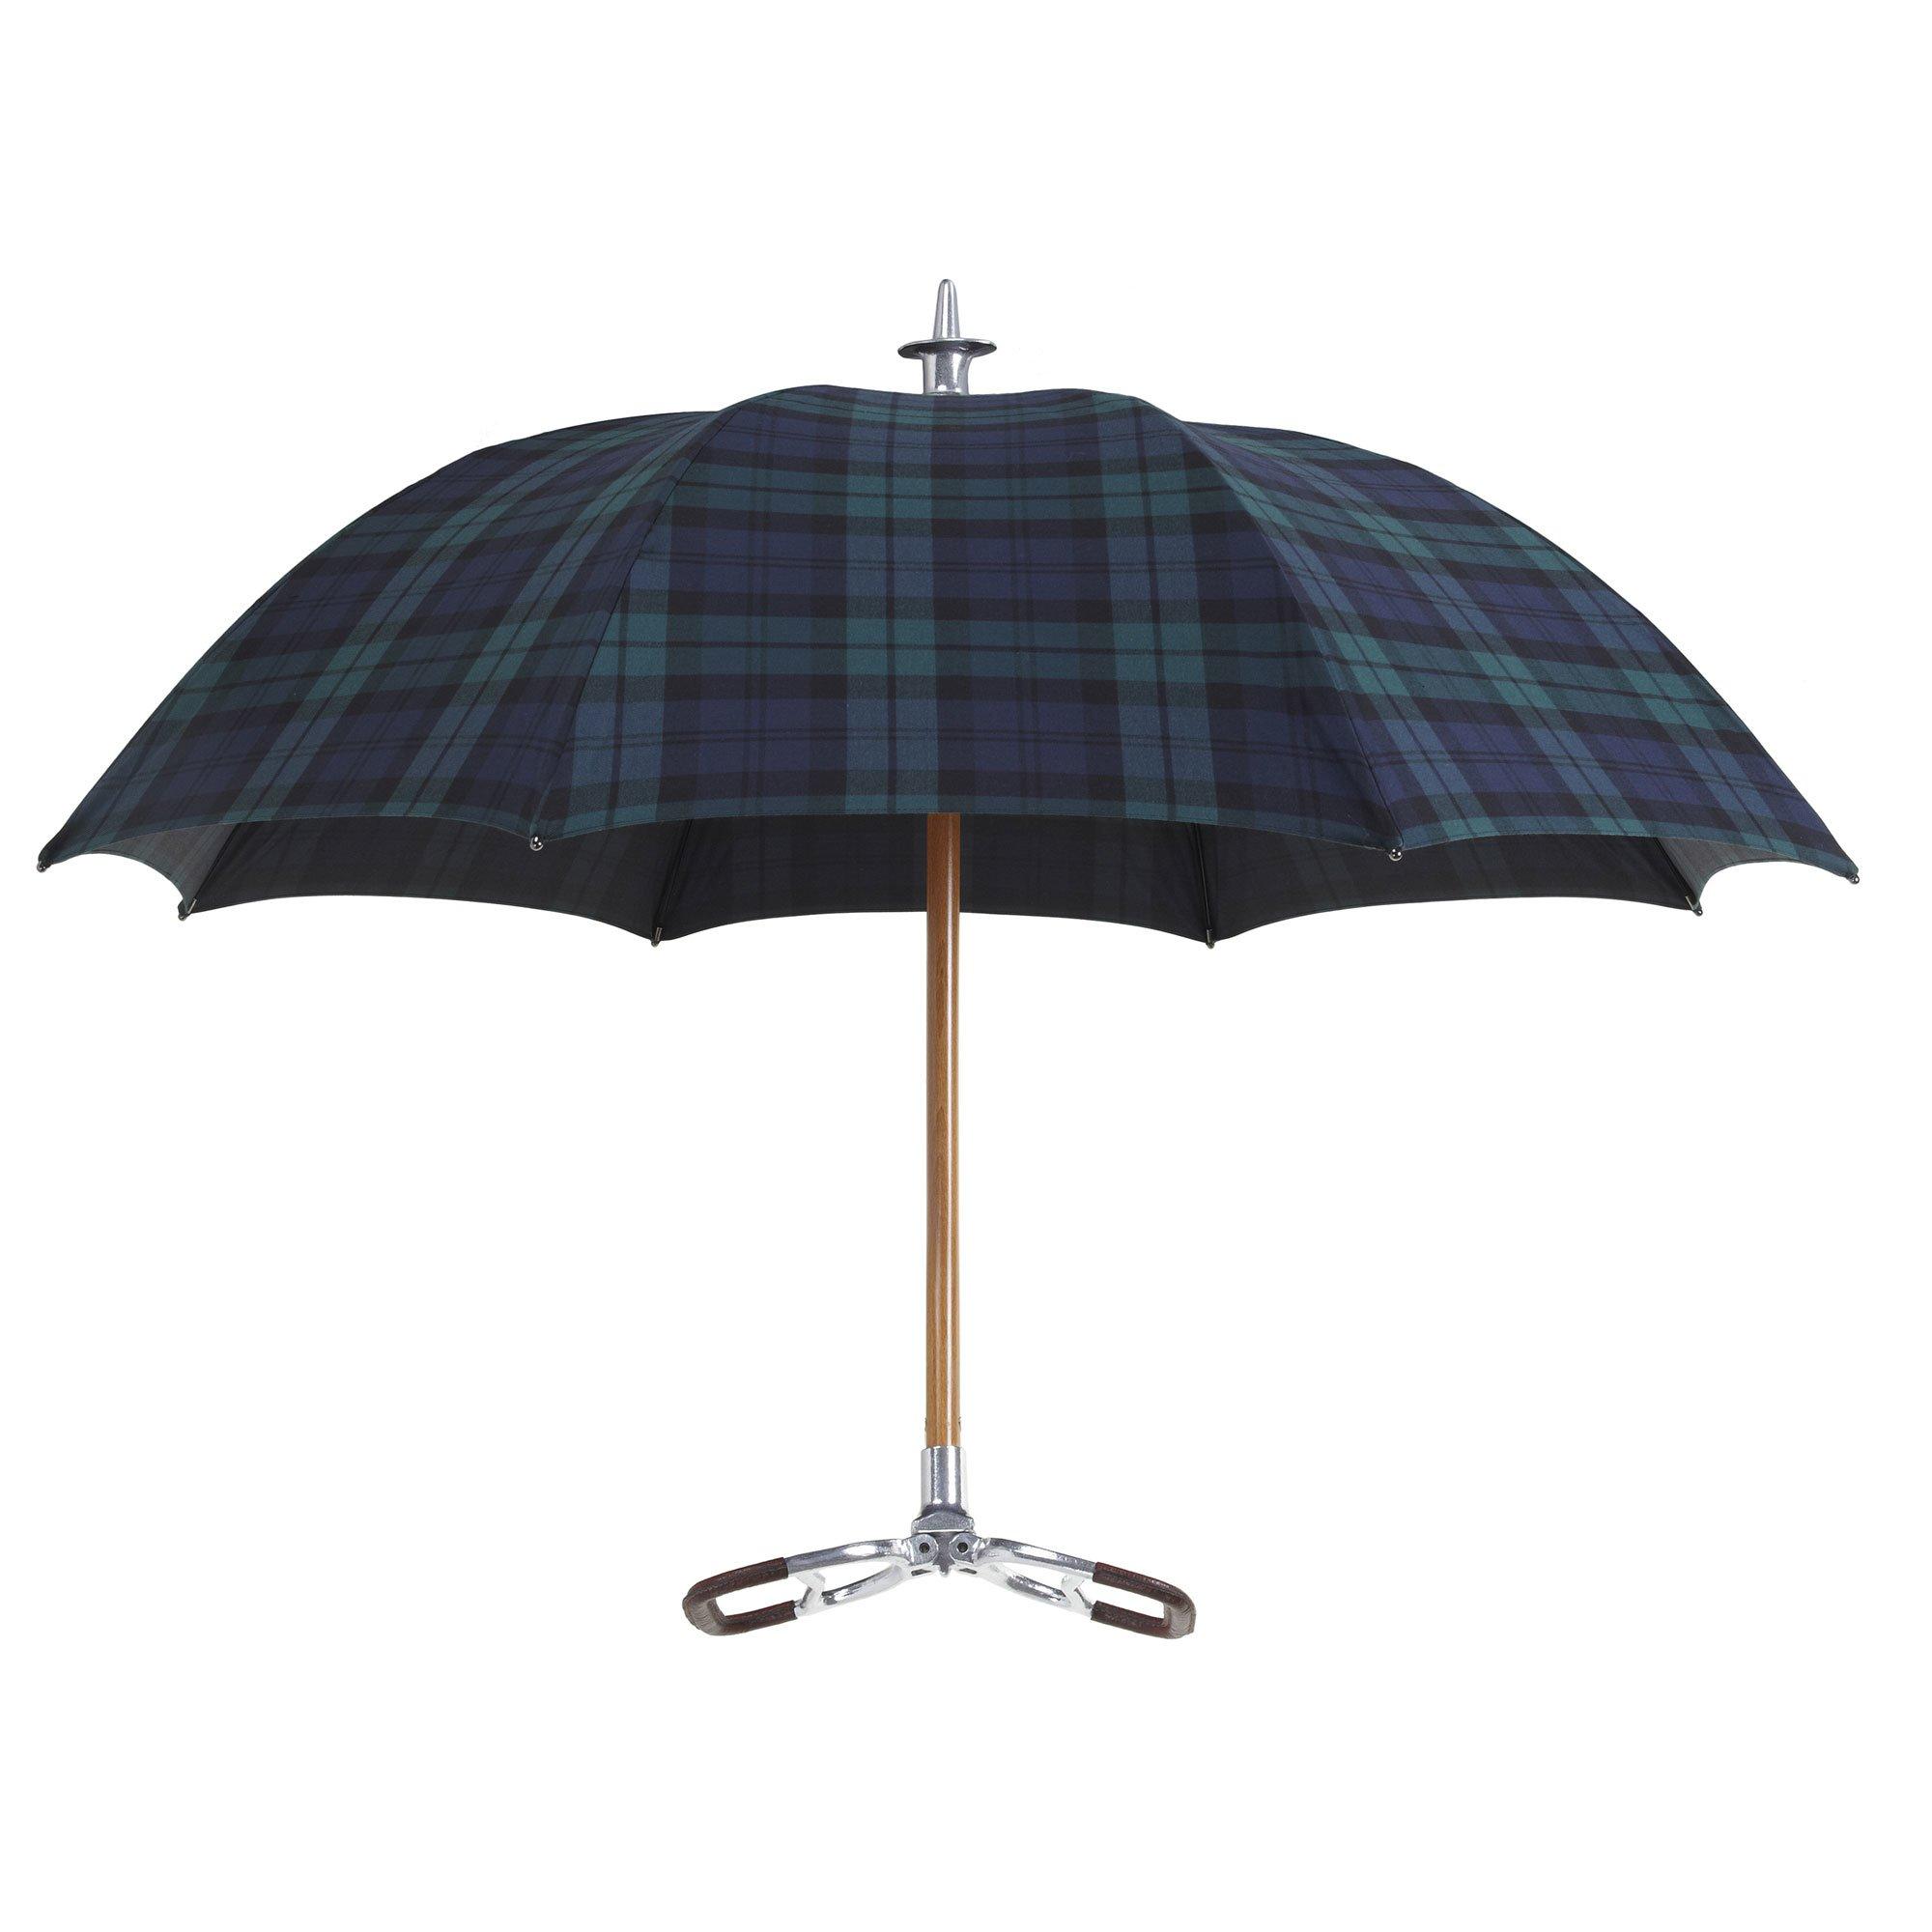 for products folding blocker umbrella stroller wheelchair uv or chair holder